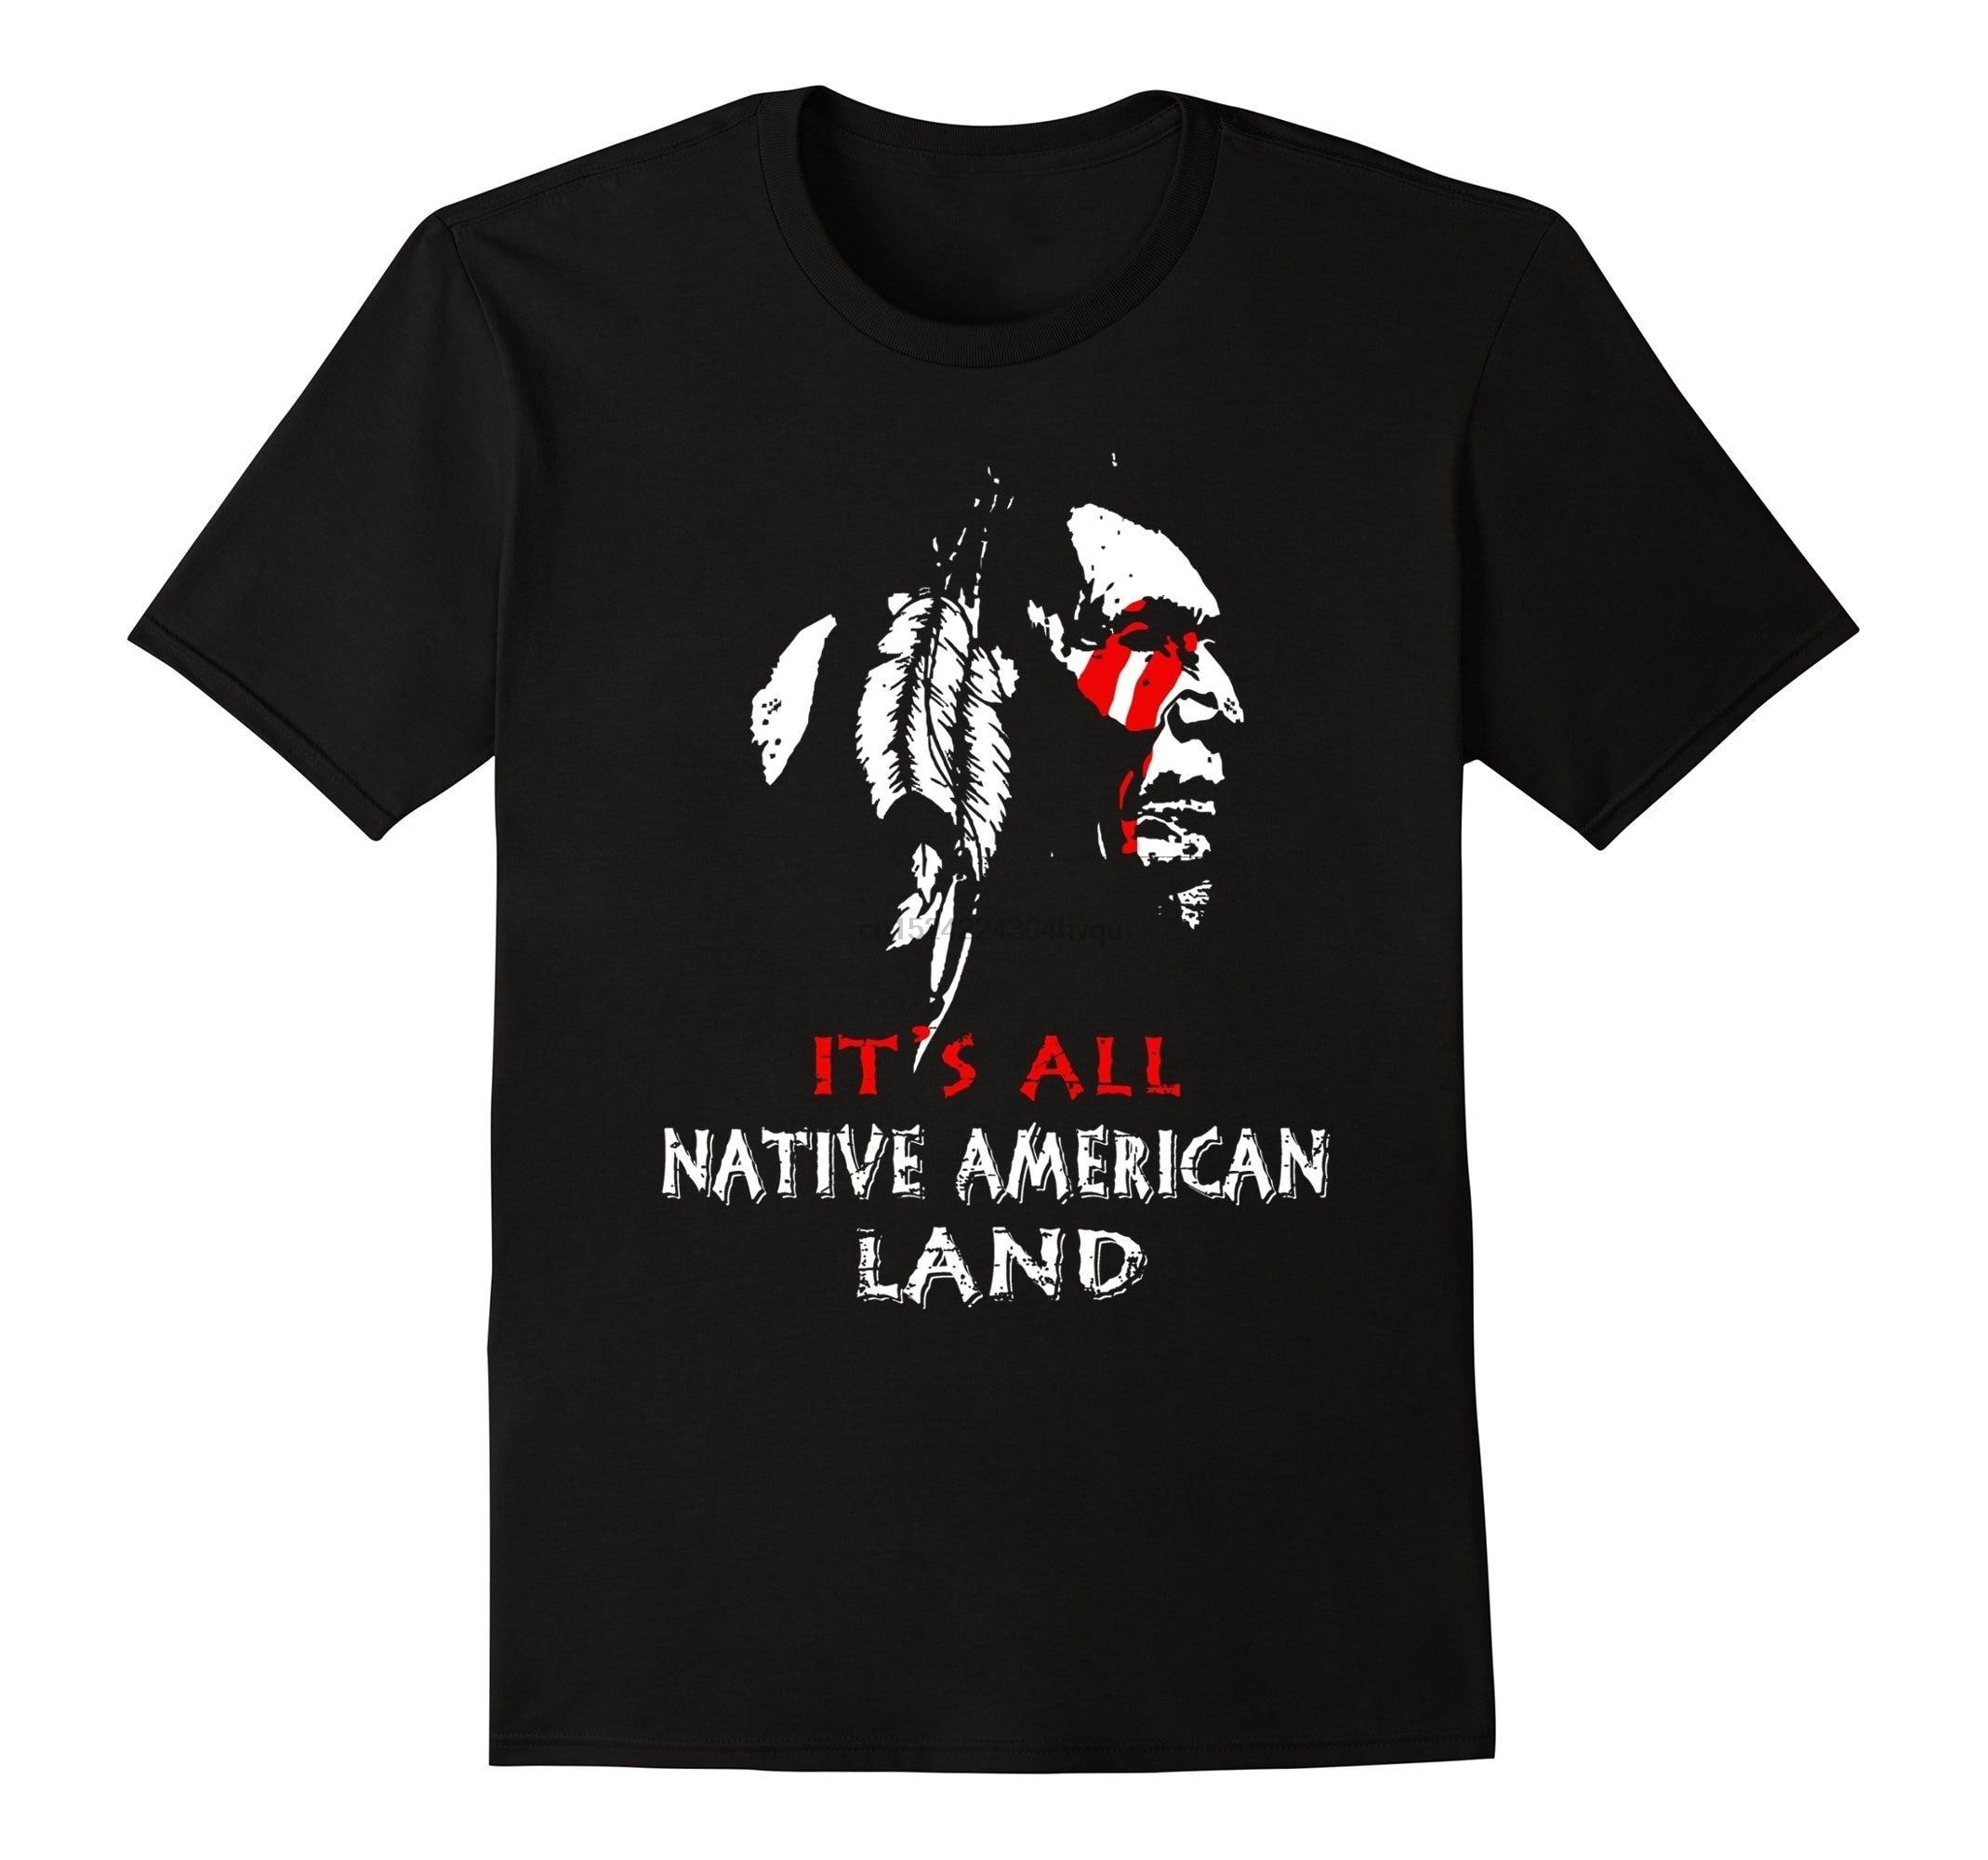 Mosaic Boston Terrier Dog T-shirt Native American Indian Puppy TShirt Tribal